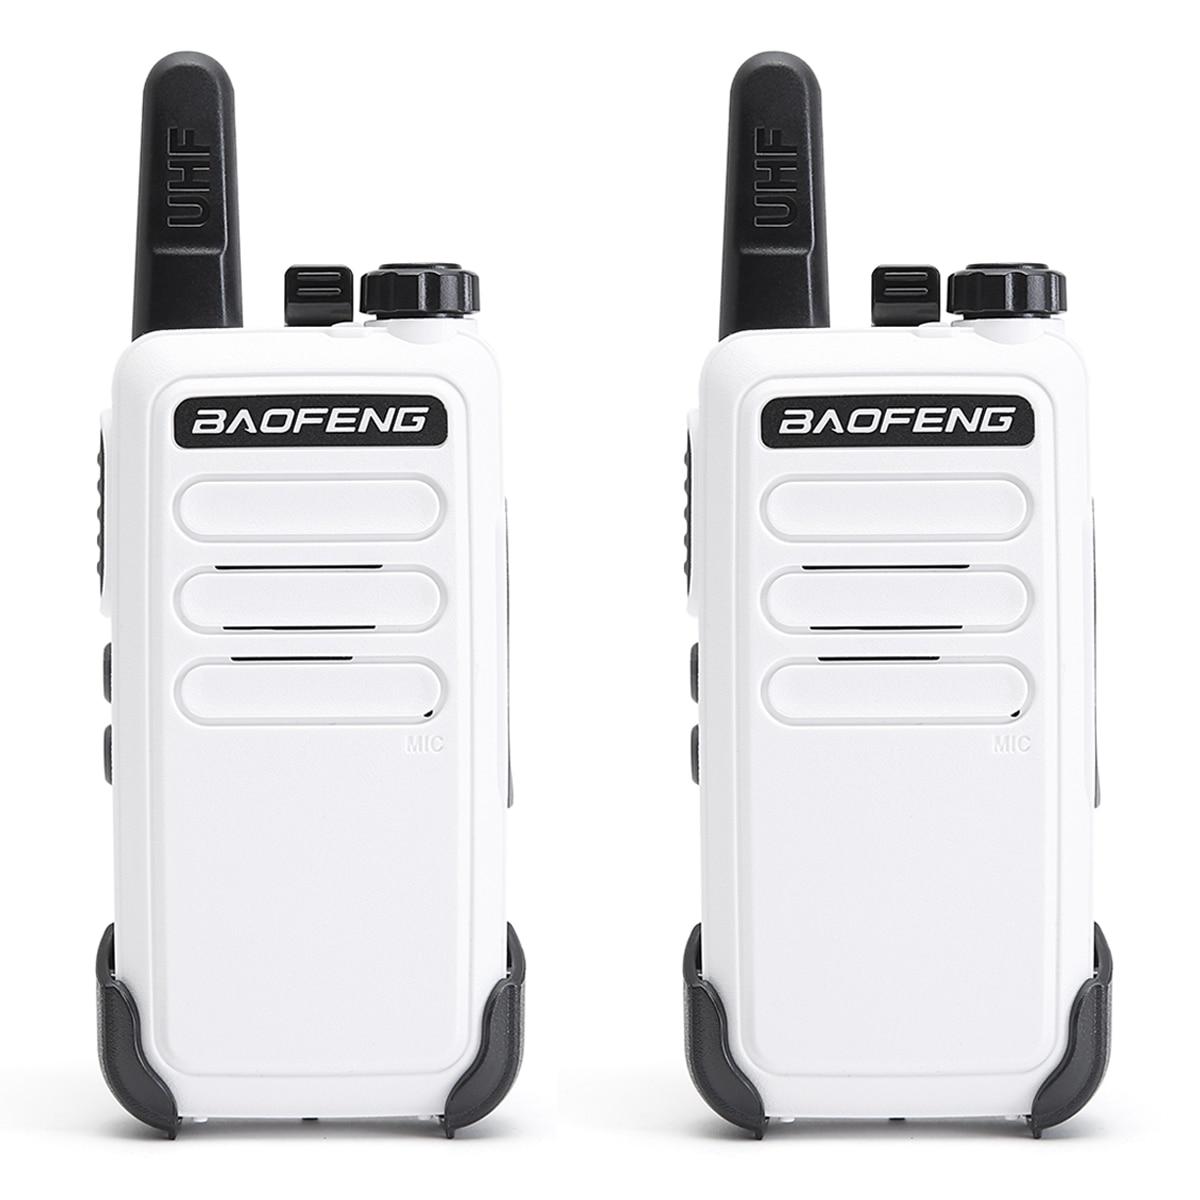 4PCS Baofeng BF-C9 Mini Walkie Talkie 400-470MHz UHF Two Way Radio bf-888s bf888s Portable VOX USB Charging Handheld Transceiver